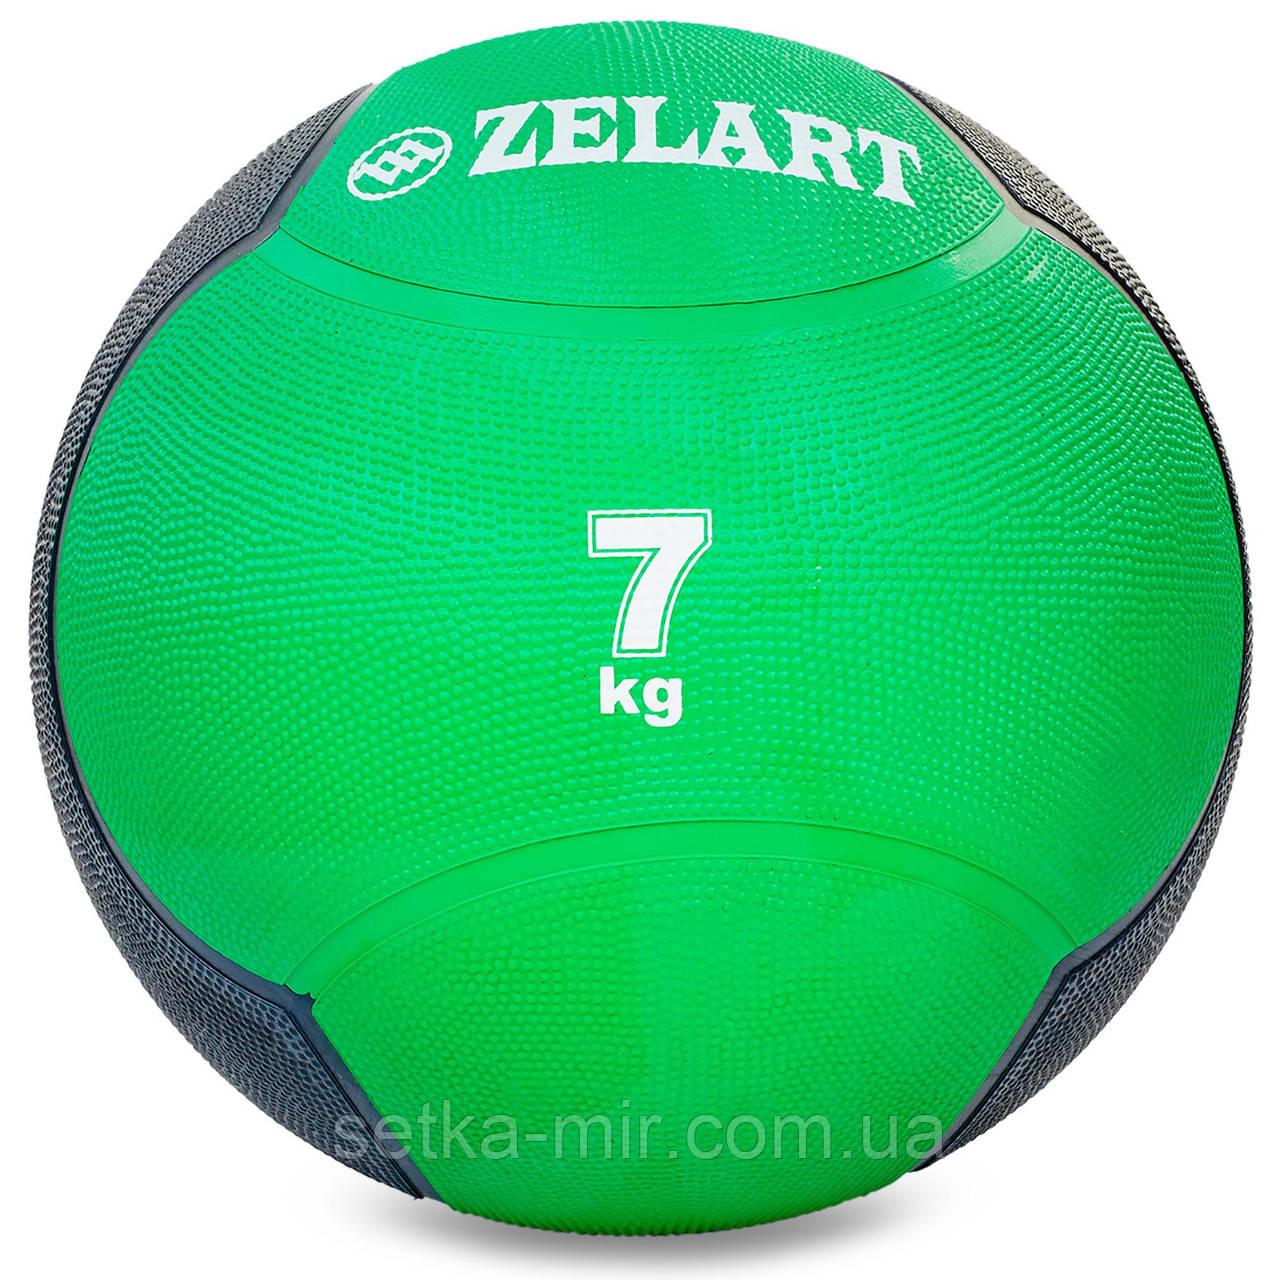 М'яч медичний медбол Zelart Medicine Ball FI-5121-7 7кг